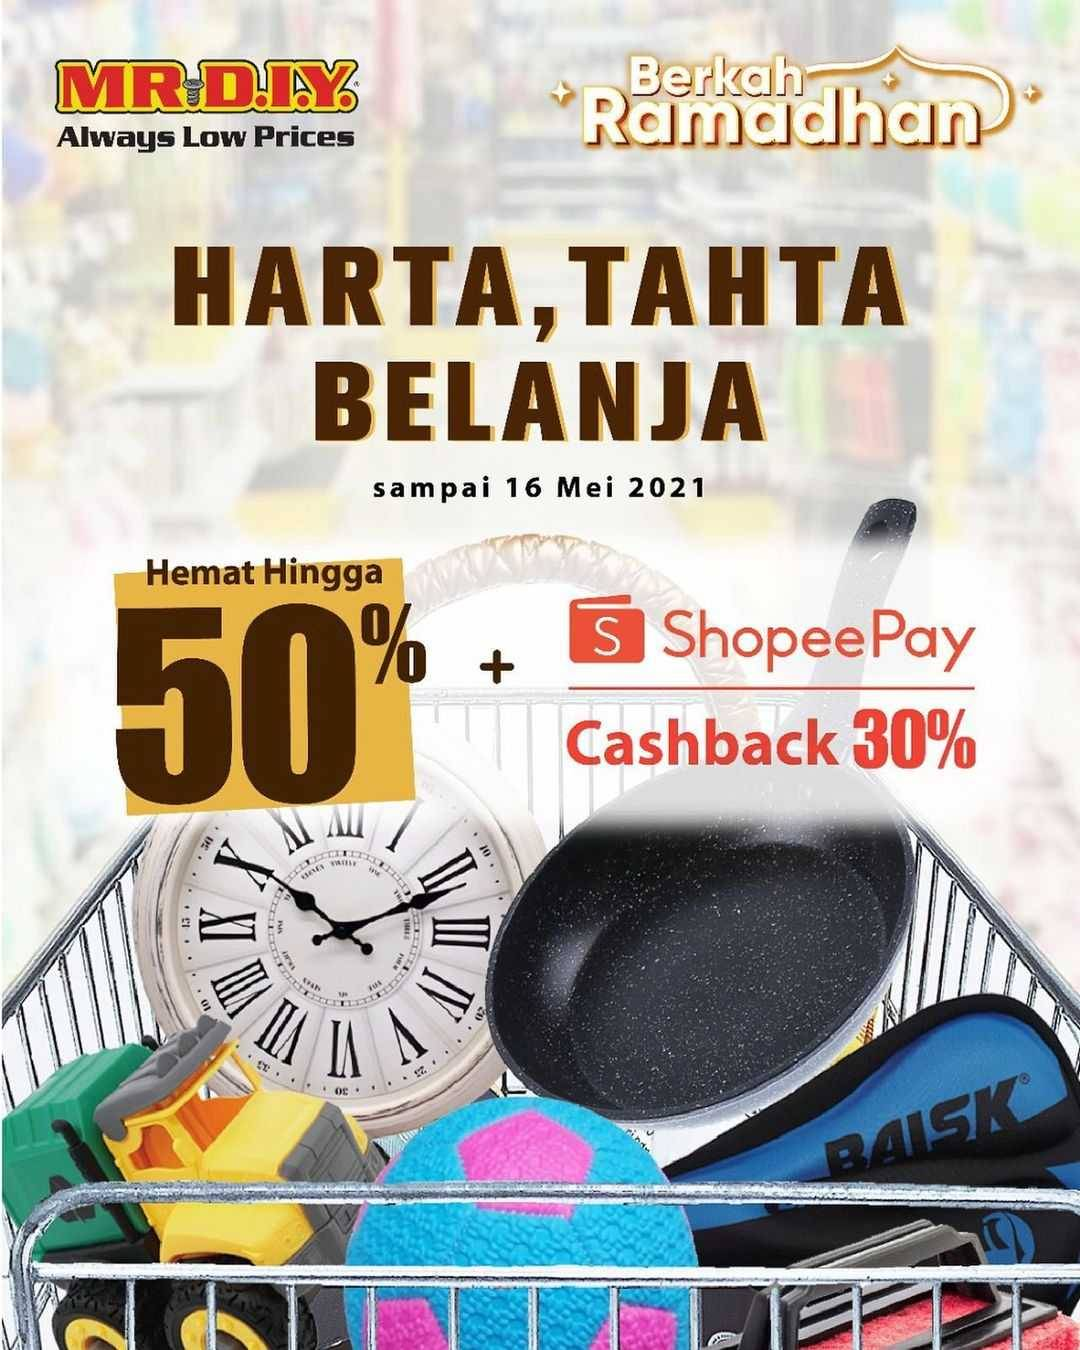 Diskon Mr DIY Diskon Hingga 50% + Cashback 30% Dengan Shopeepay